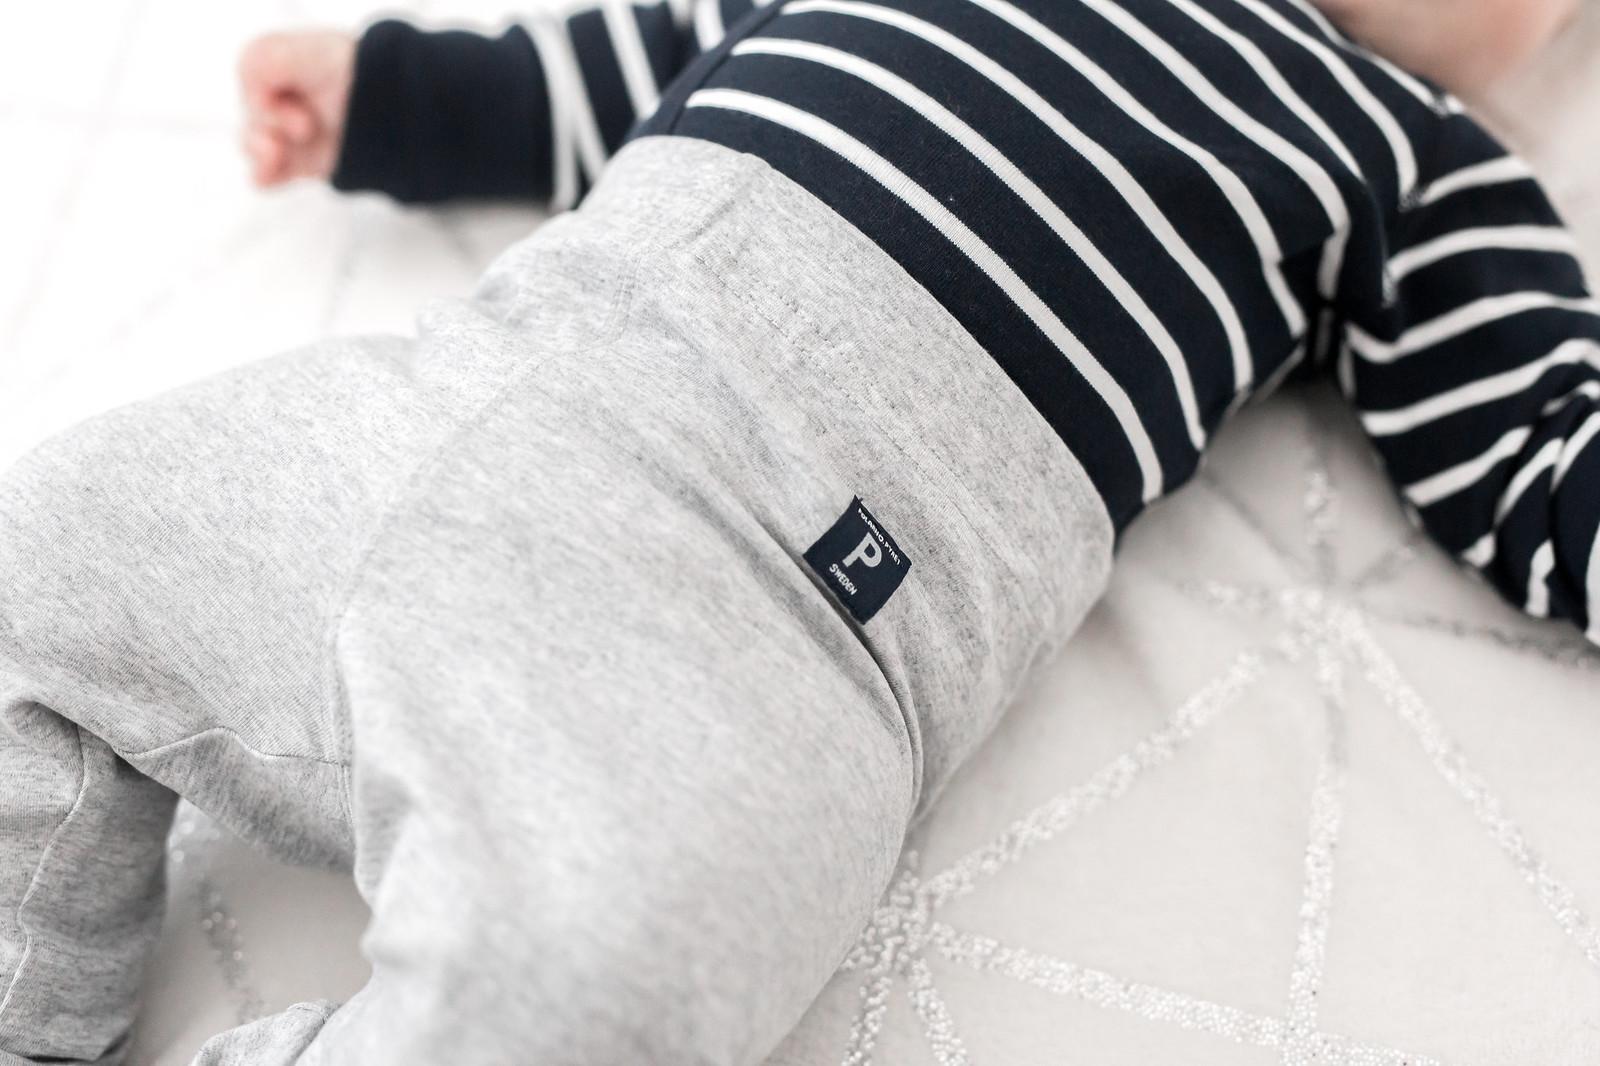 polarn o. pyret vauvanvaatteet